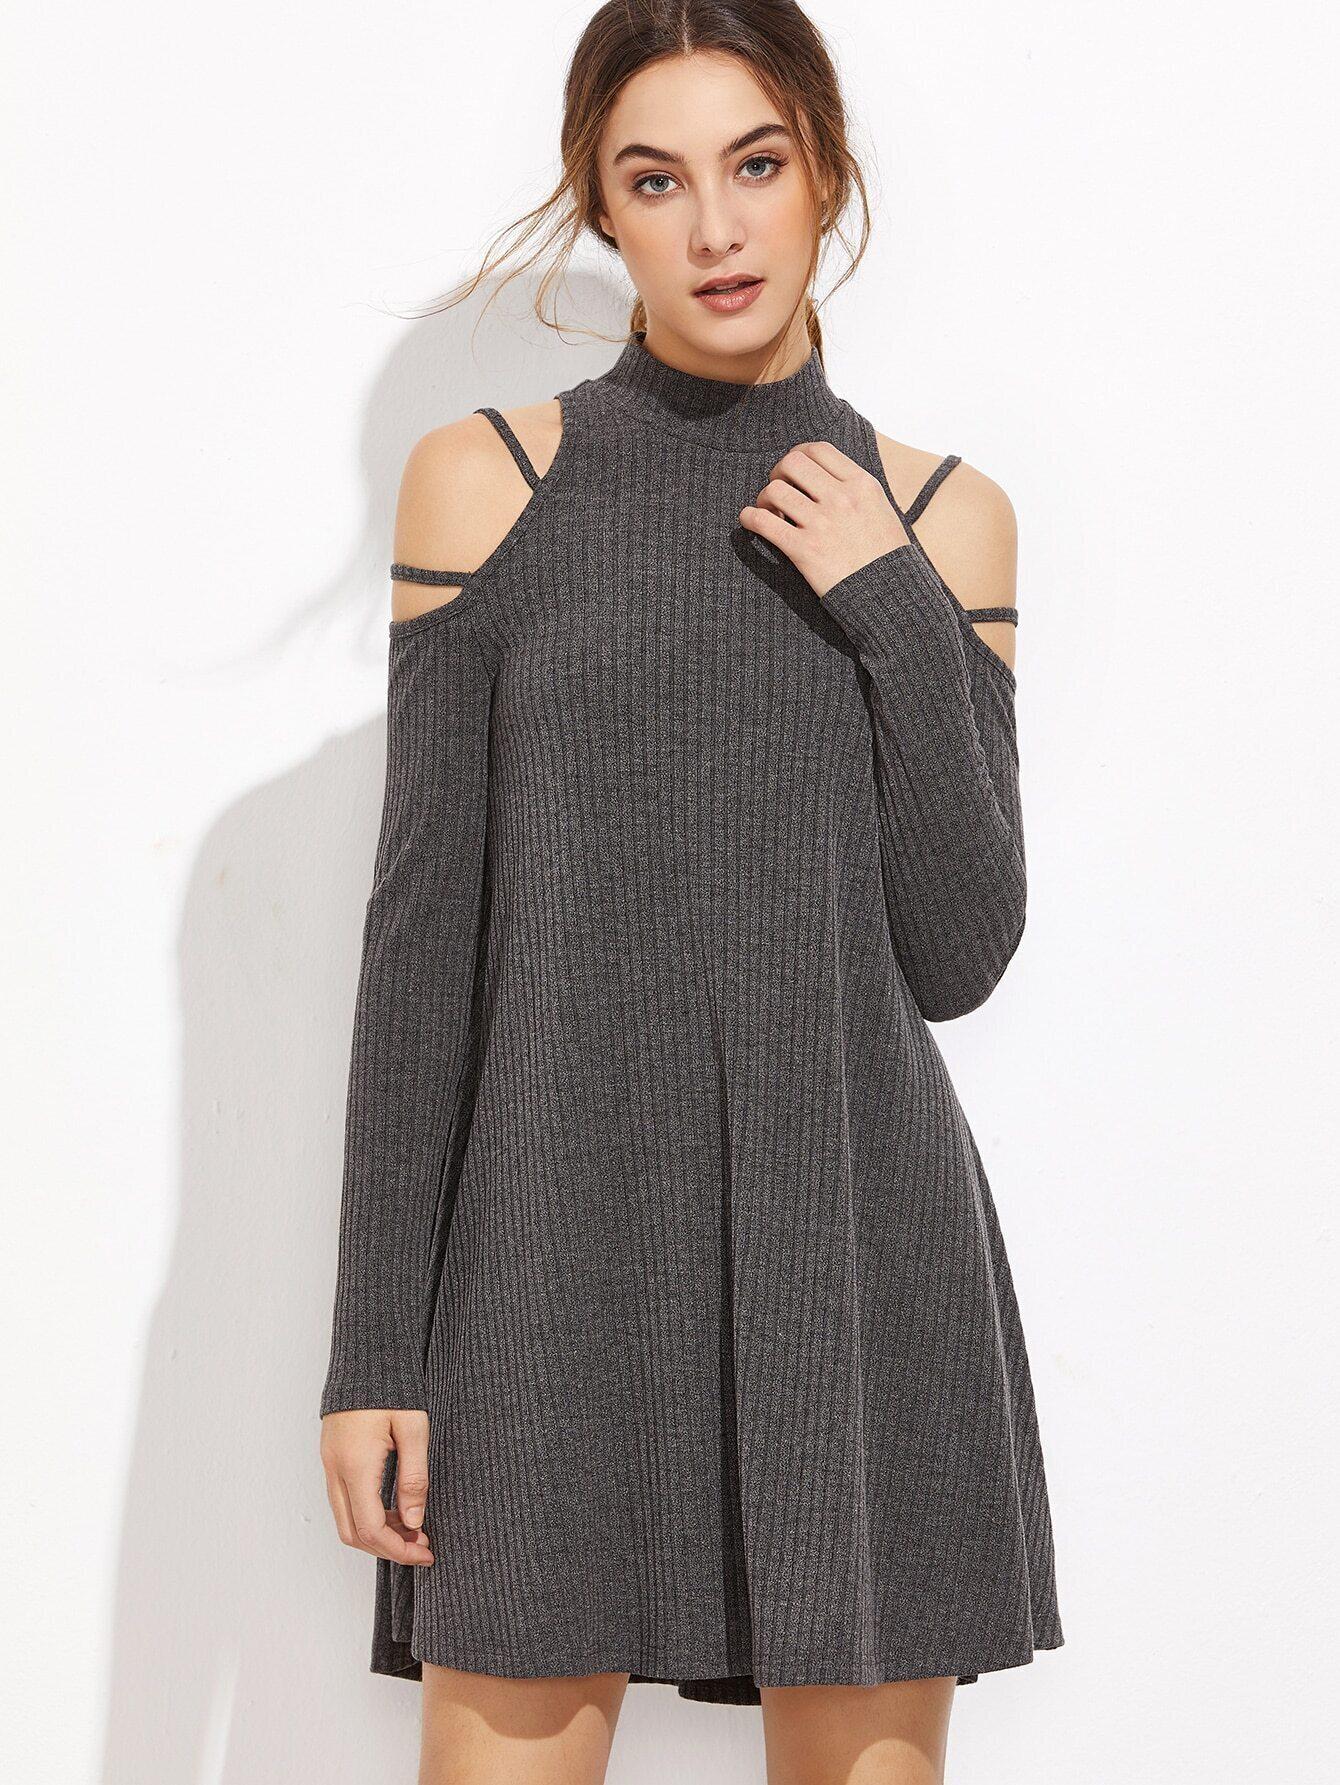 Grey Ribbed Knit Strappy Cold Shoulder Dress